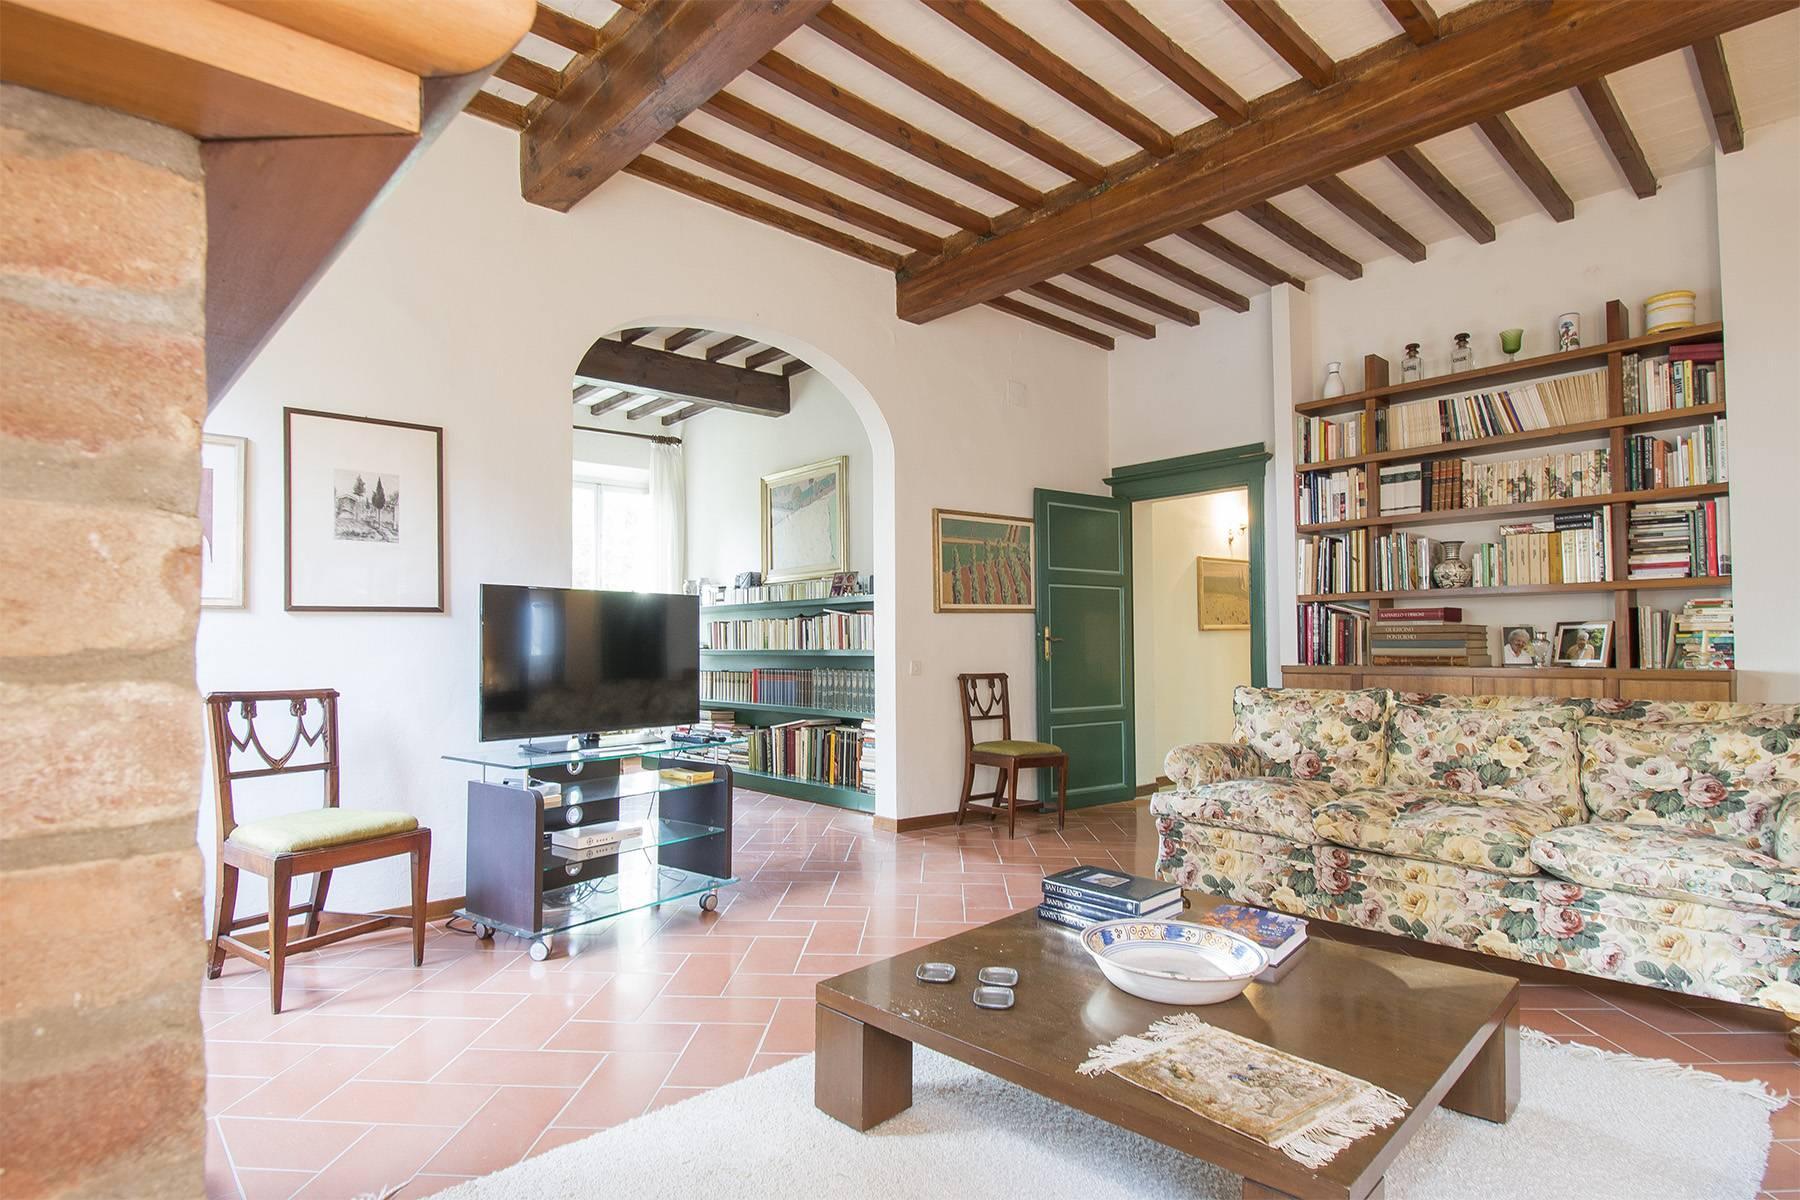 Winery with Historic Villa in San Miniato, Pisa - 20